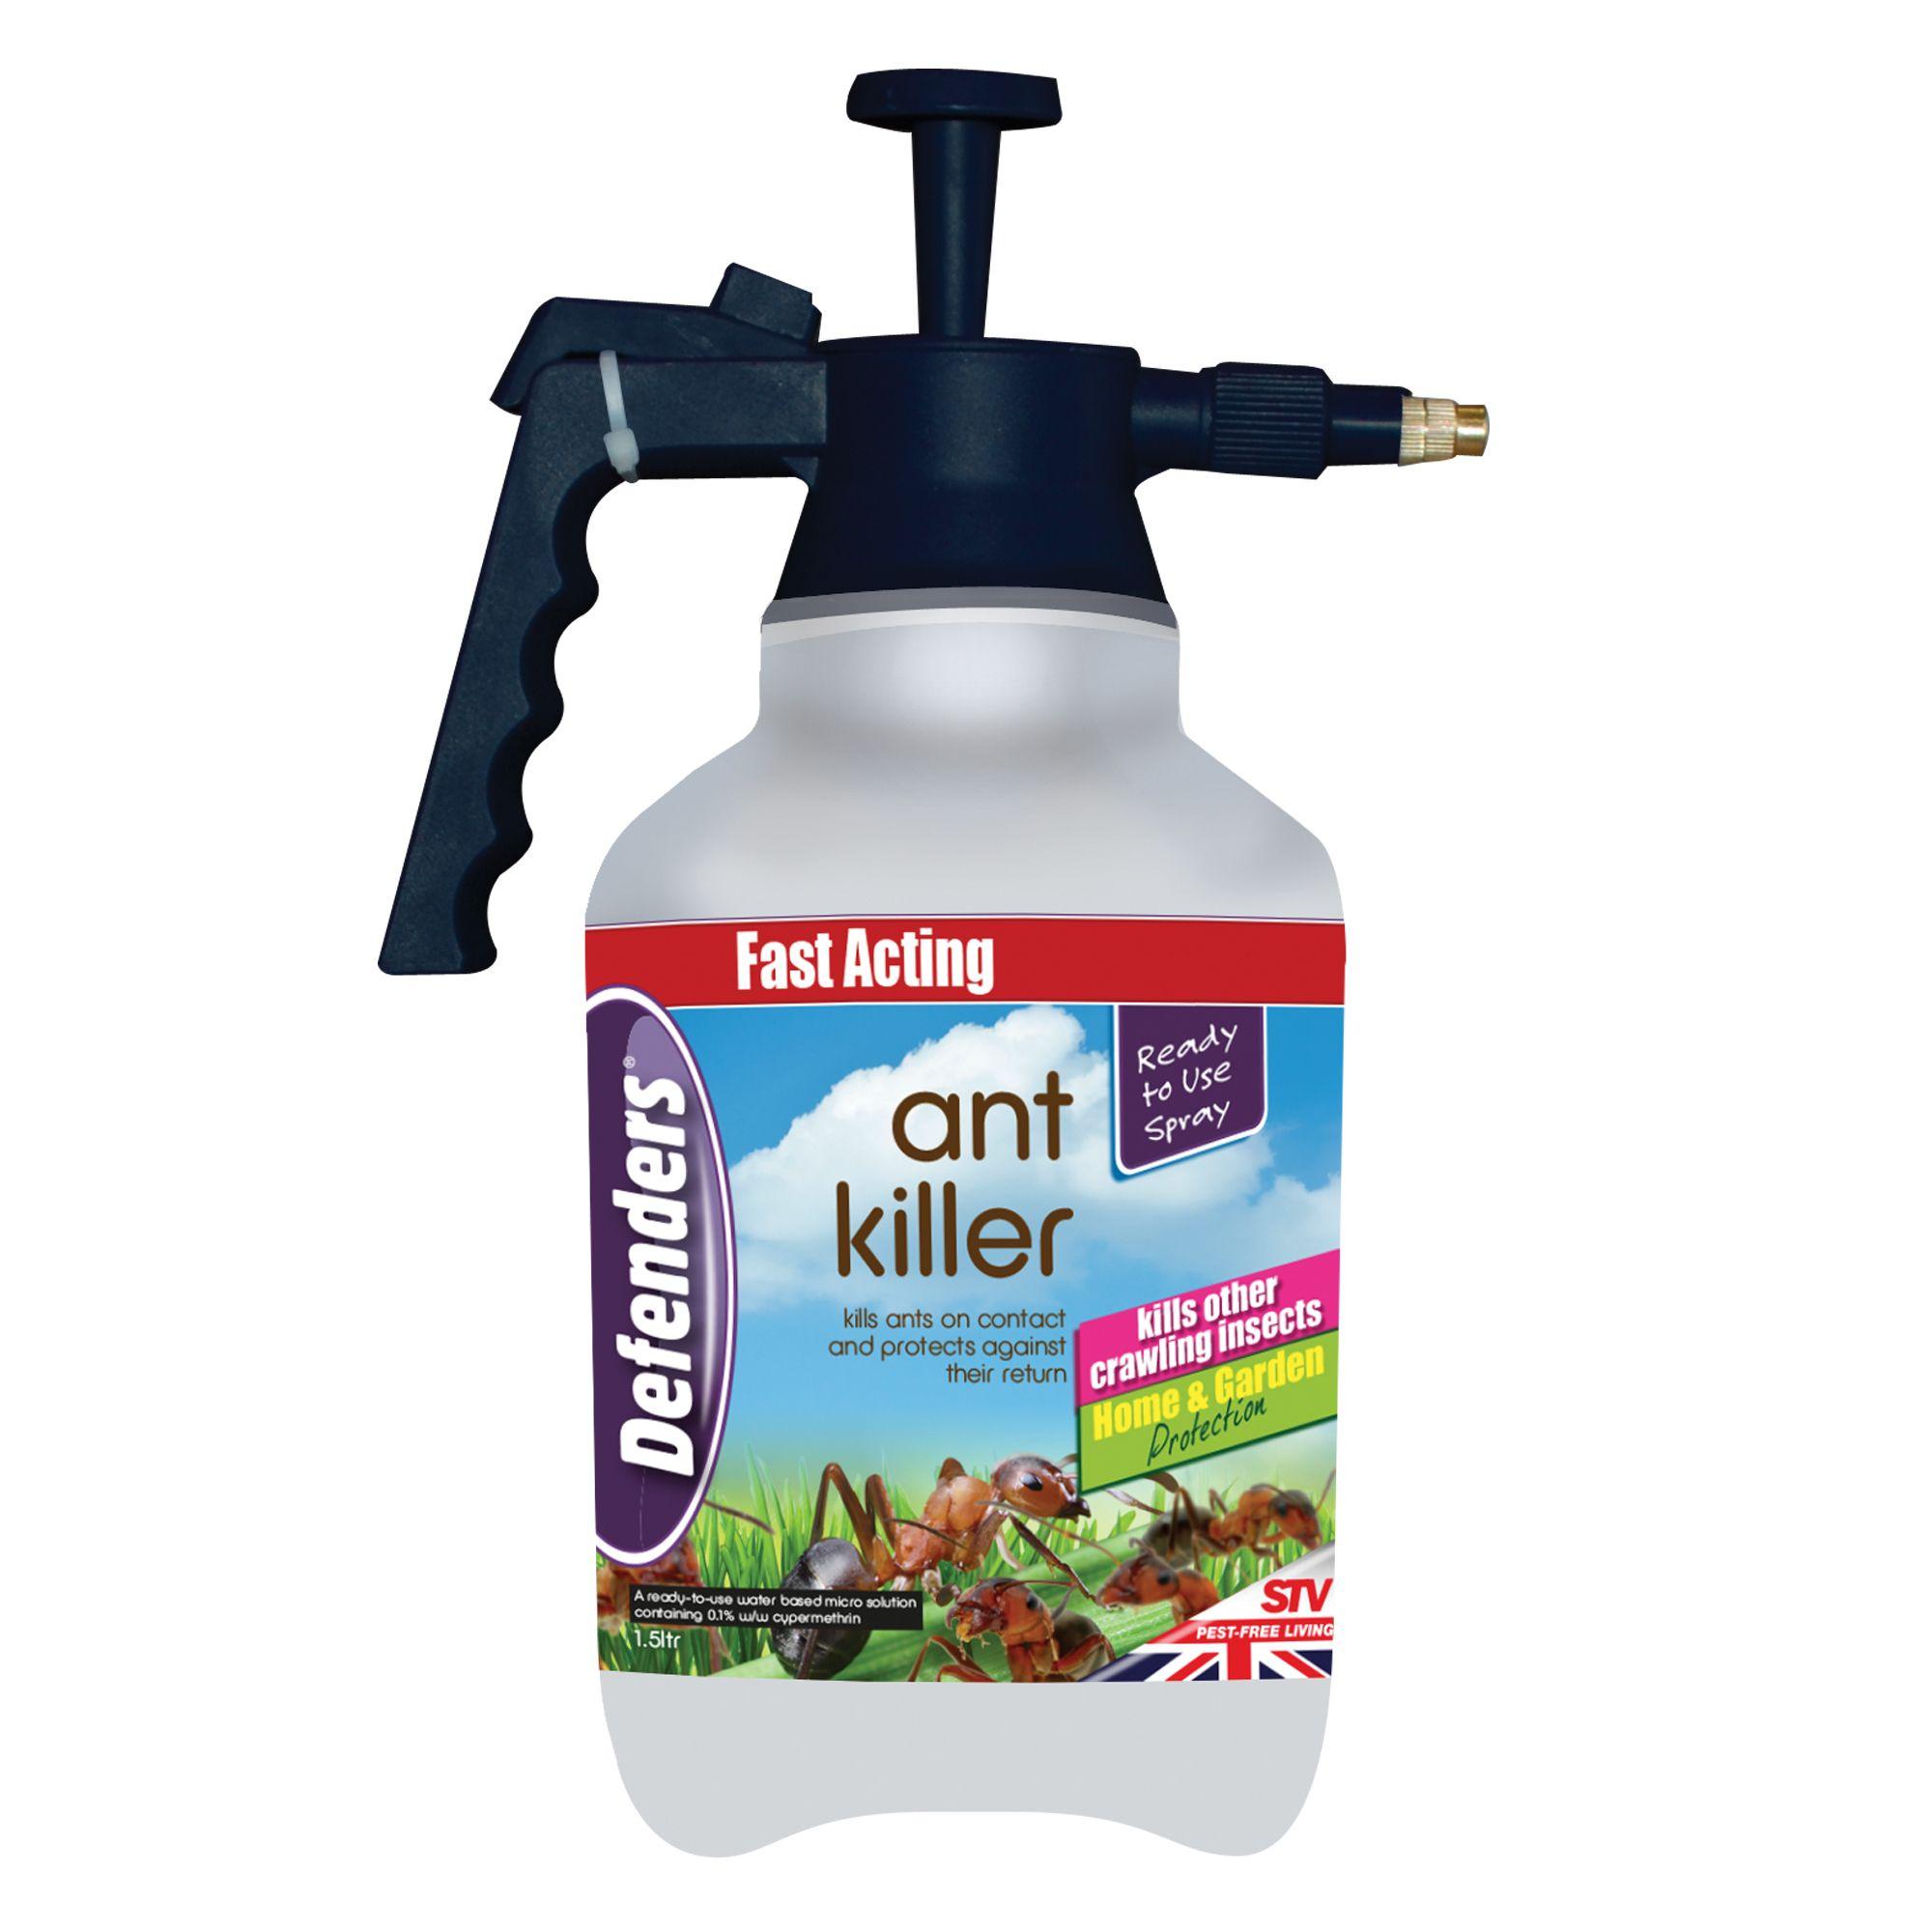 Defenders Ant Killer Insect Spray 1 5l 1812g Departments Diy At B Q